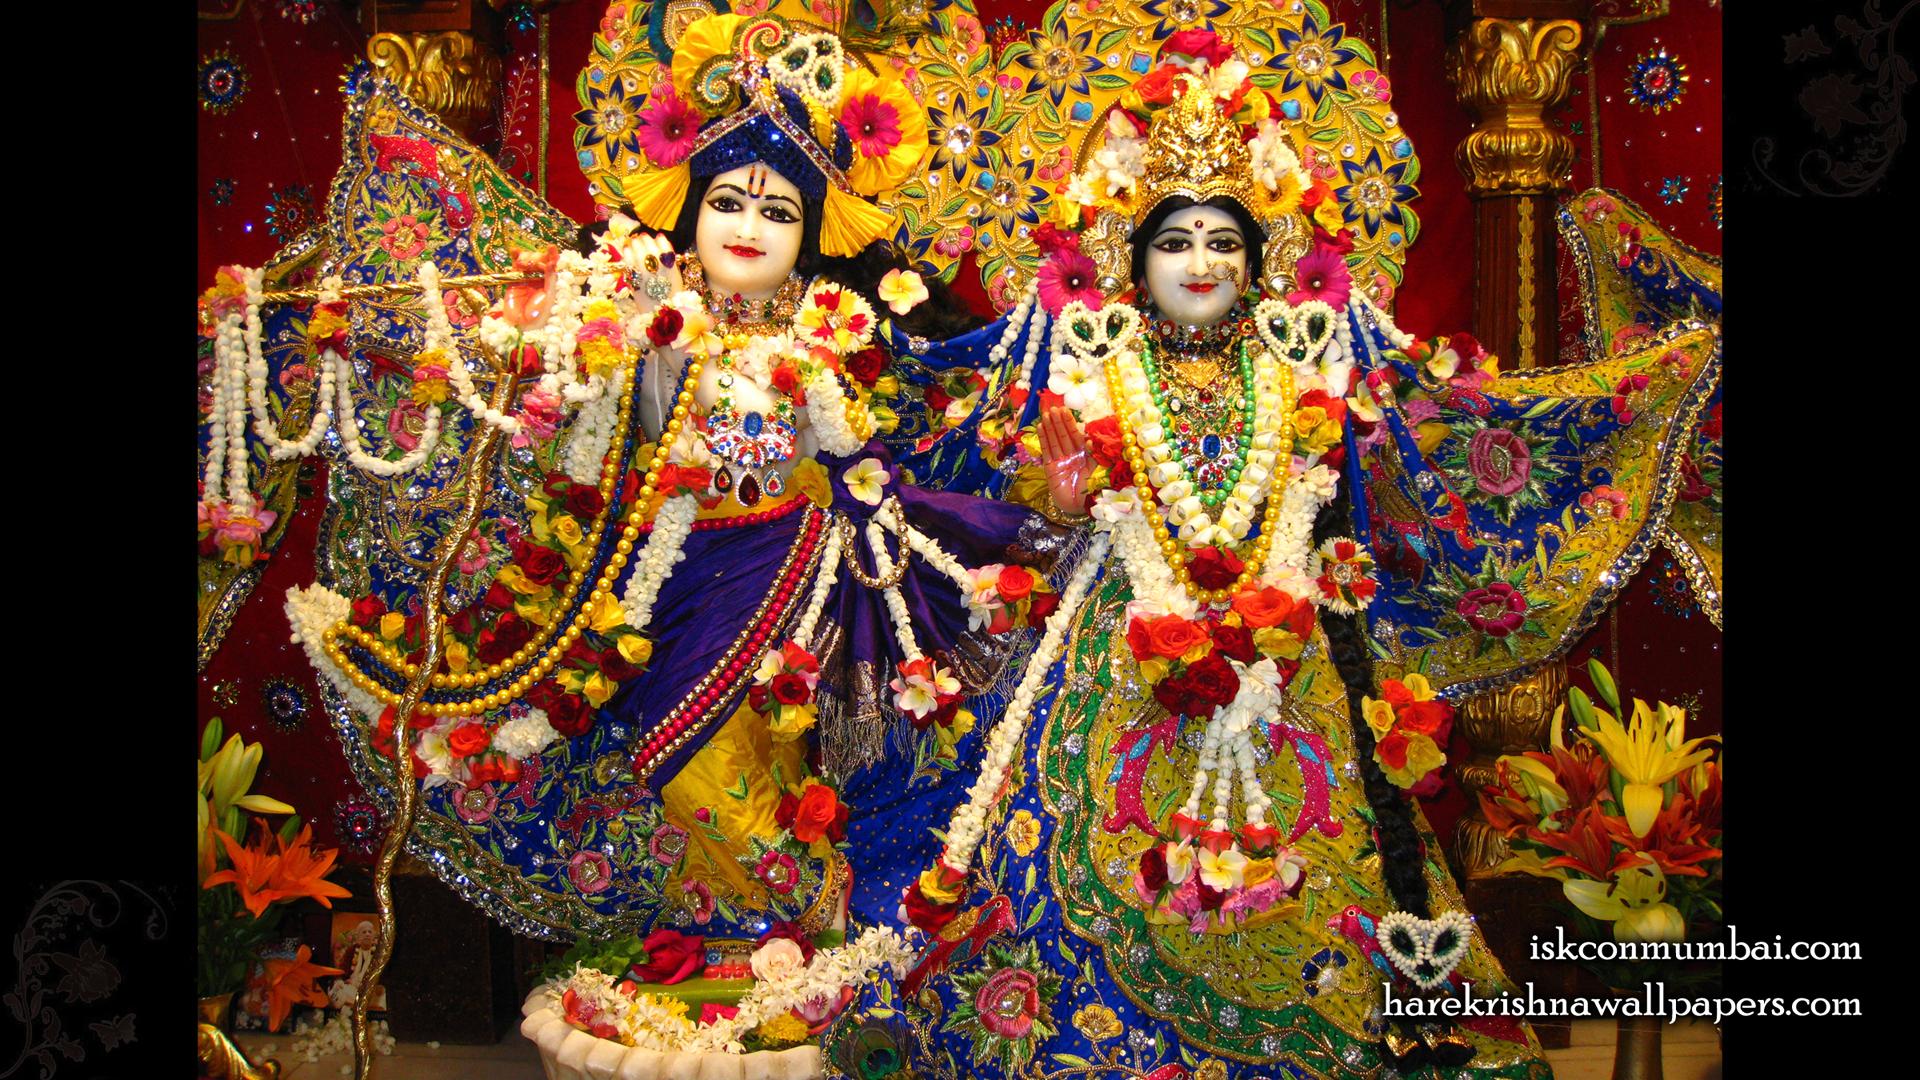 Radha krishna wallpapers full size - Download